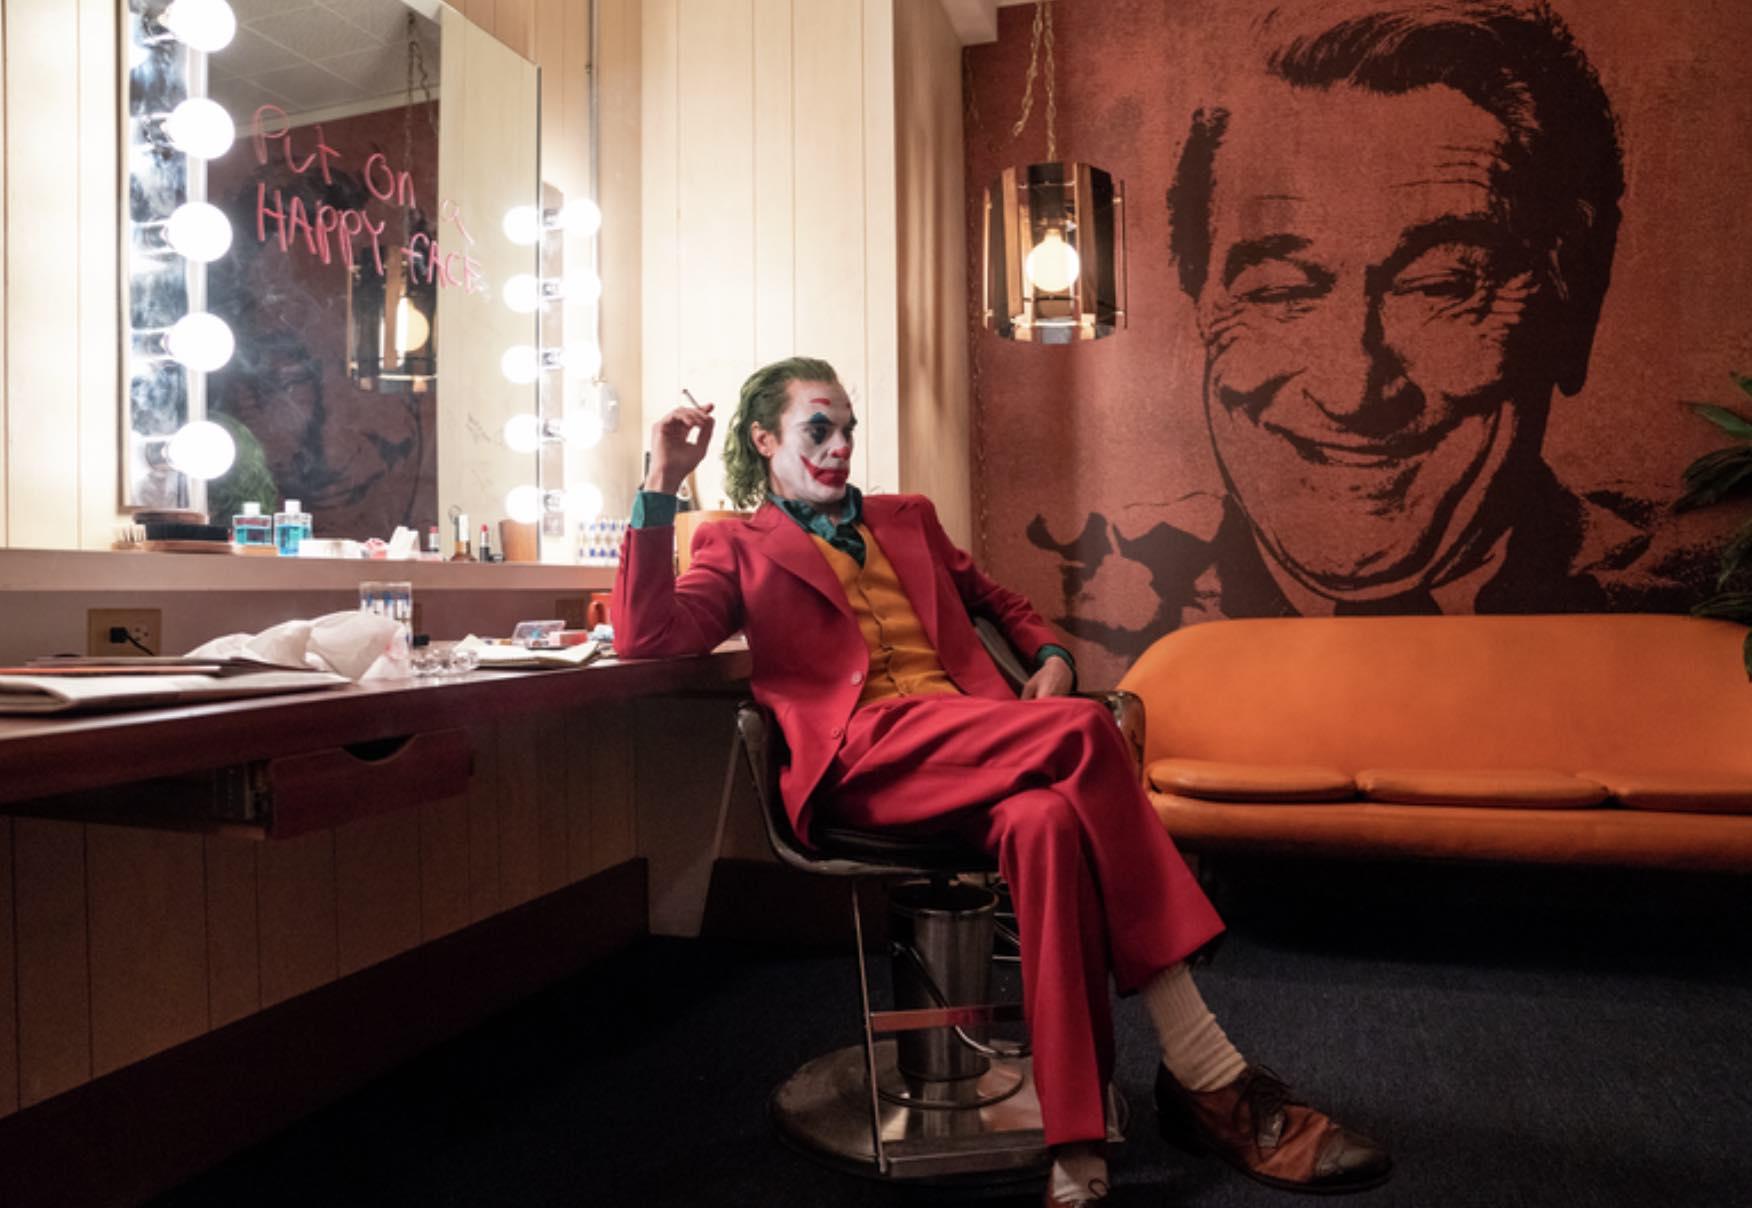 Joker Joaquin Phoenix movie review